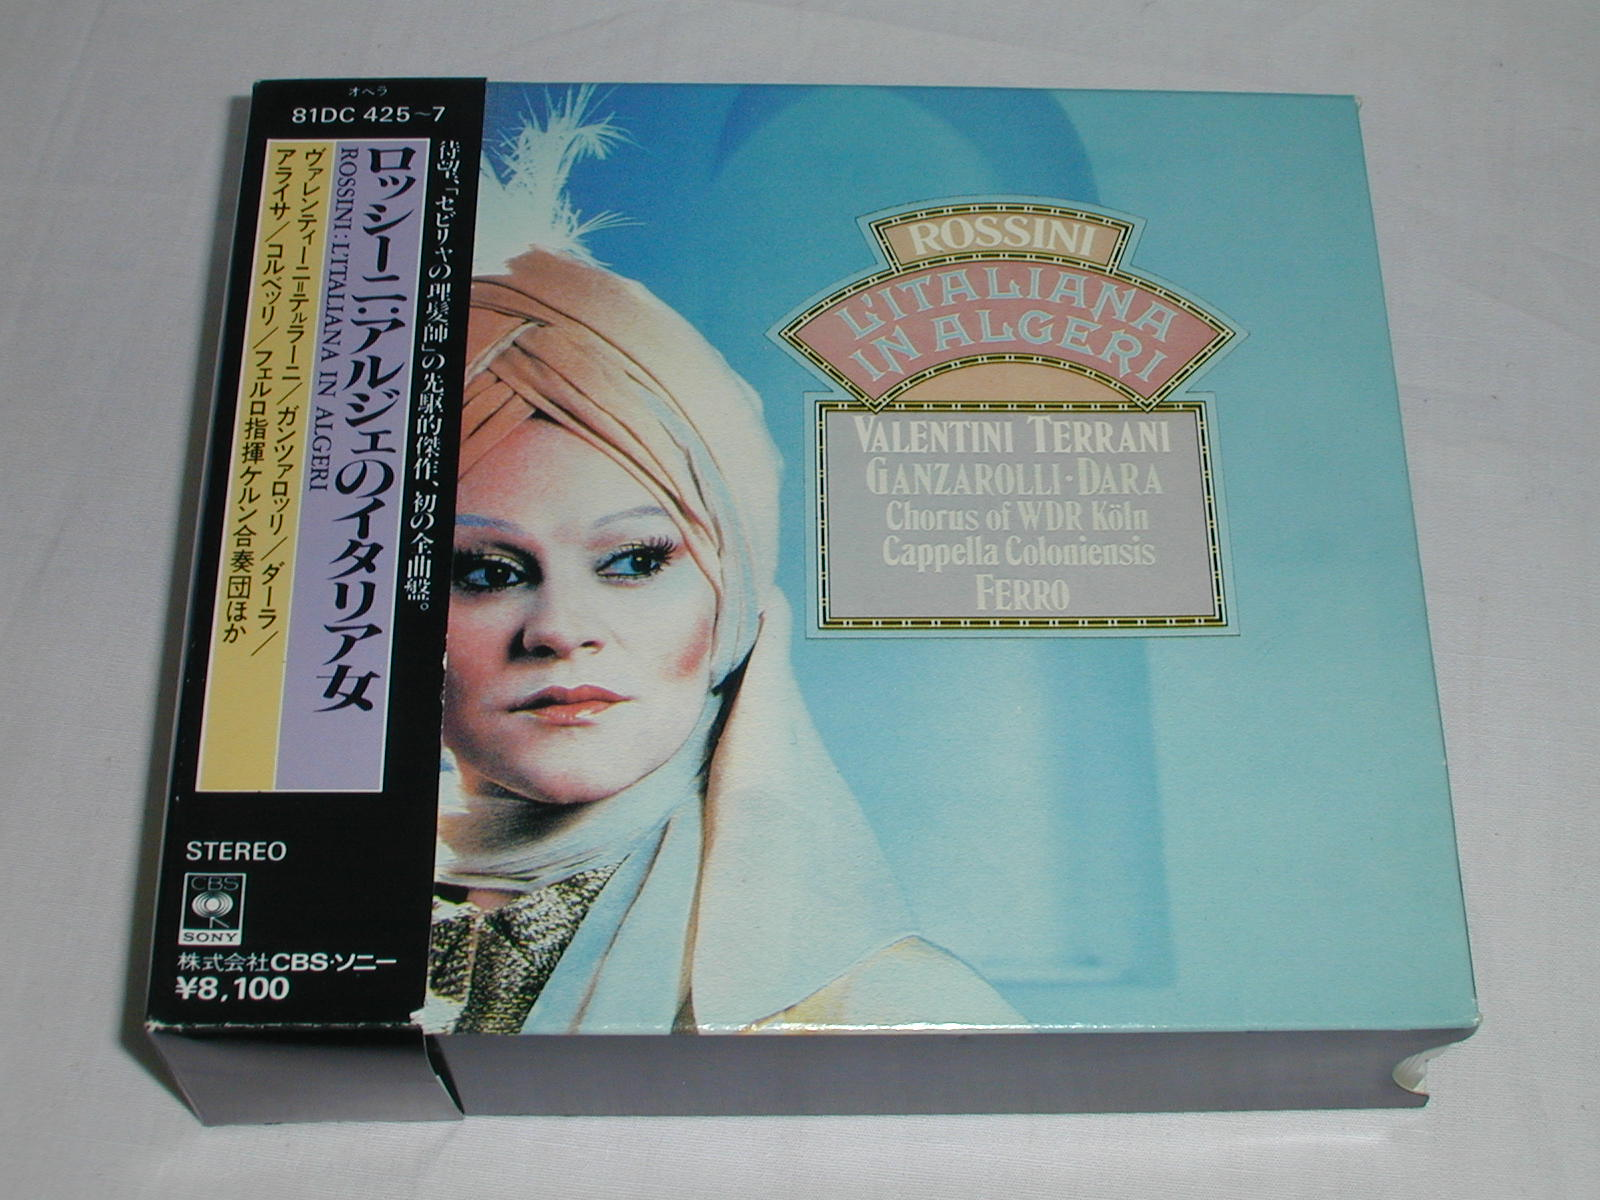 (CD) ロッシーニ:喜歌劇「アルジェのイタリア女」全曲 /フェロル <3枚組>